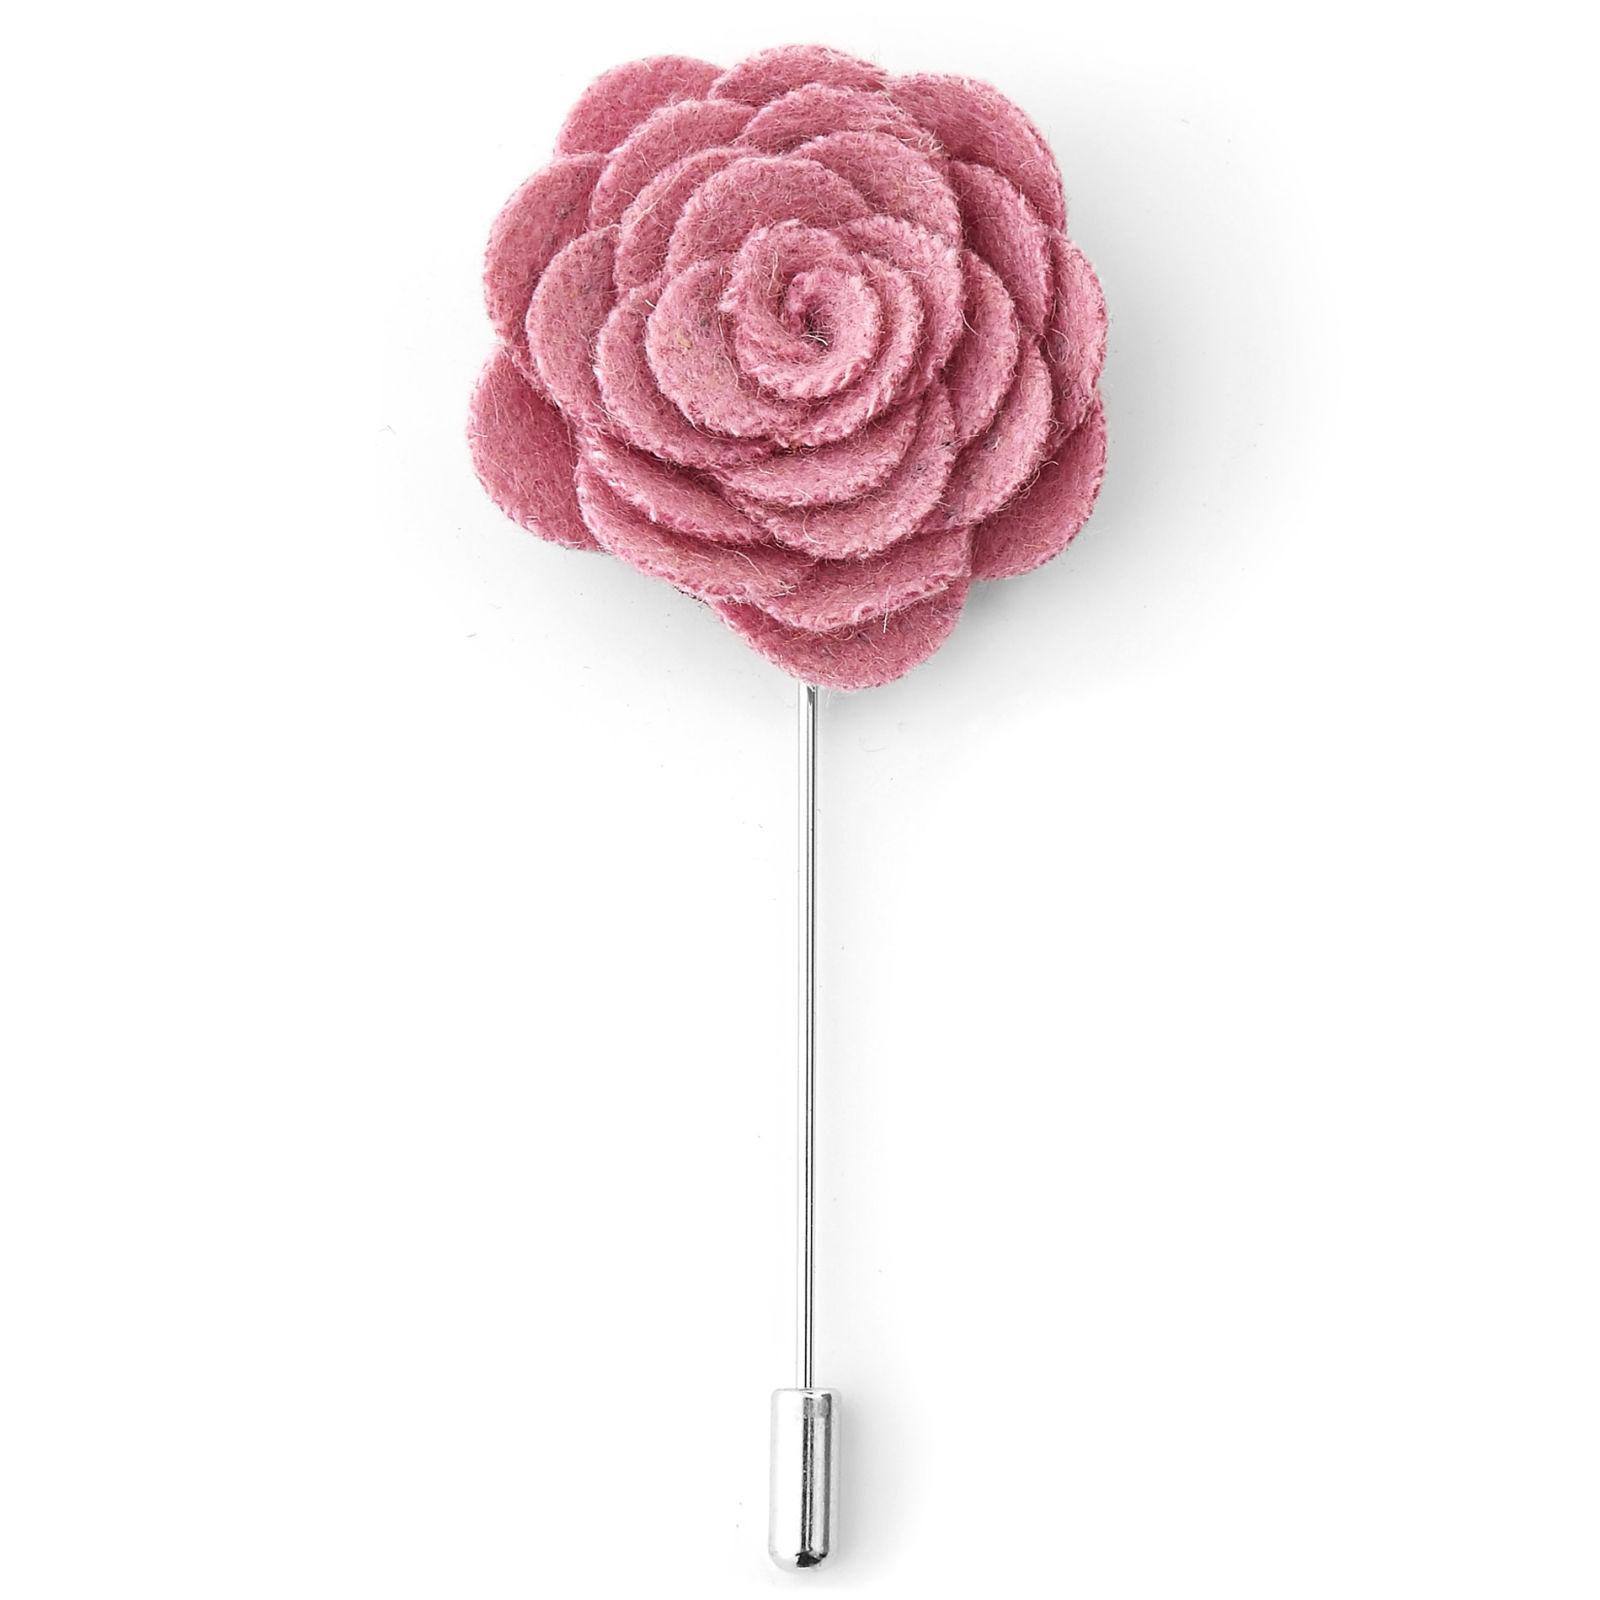 Warren Asher Pinkki ruusu -rintaneula